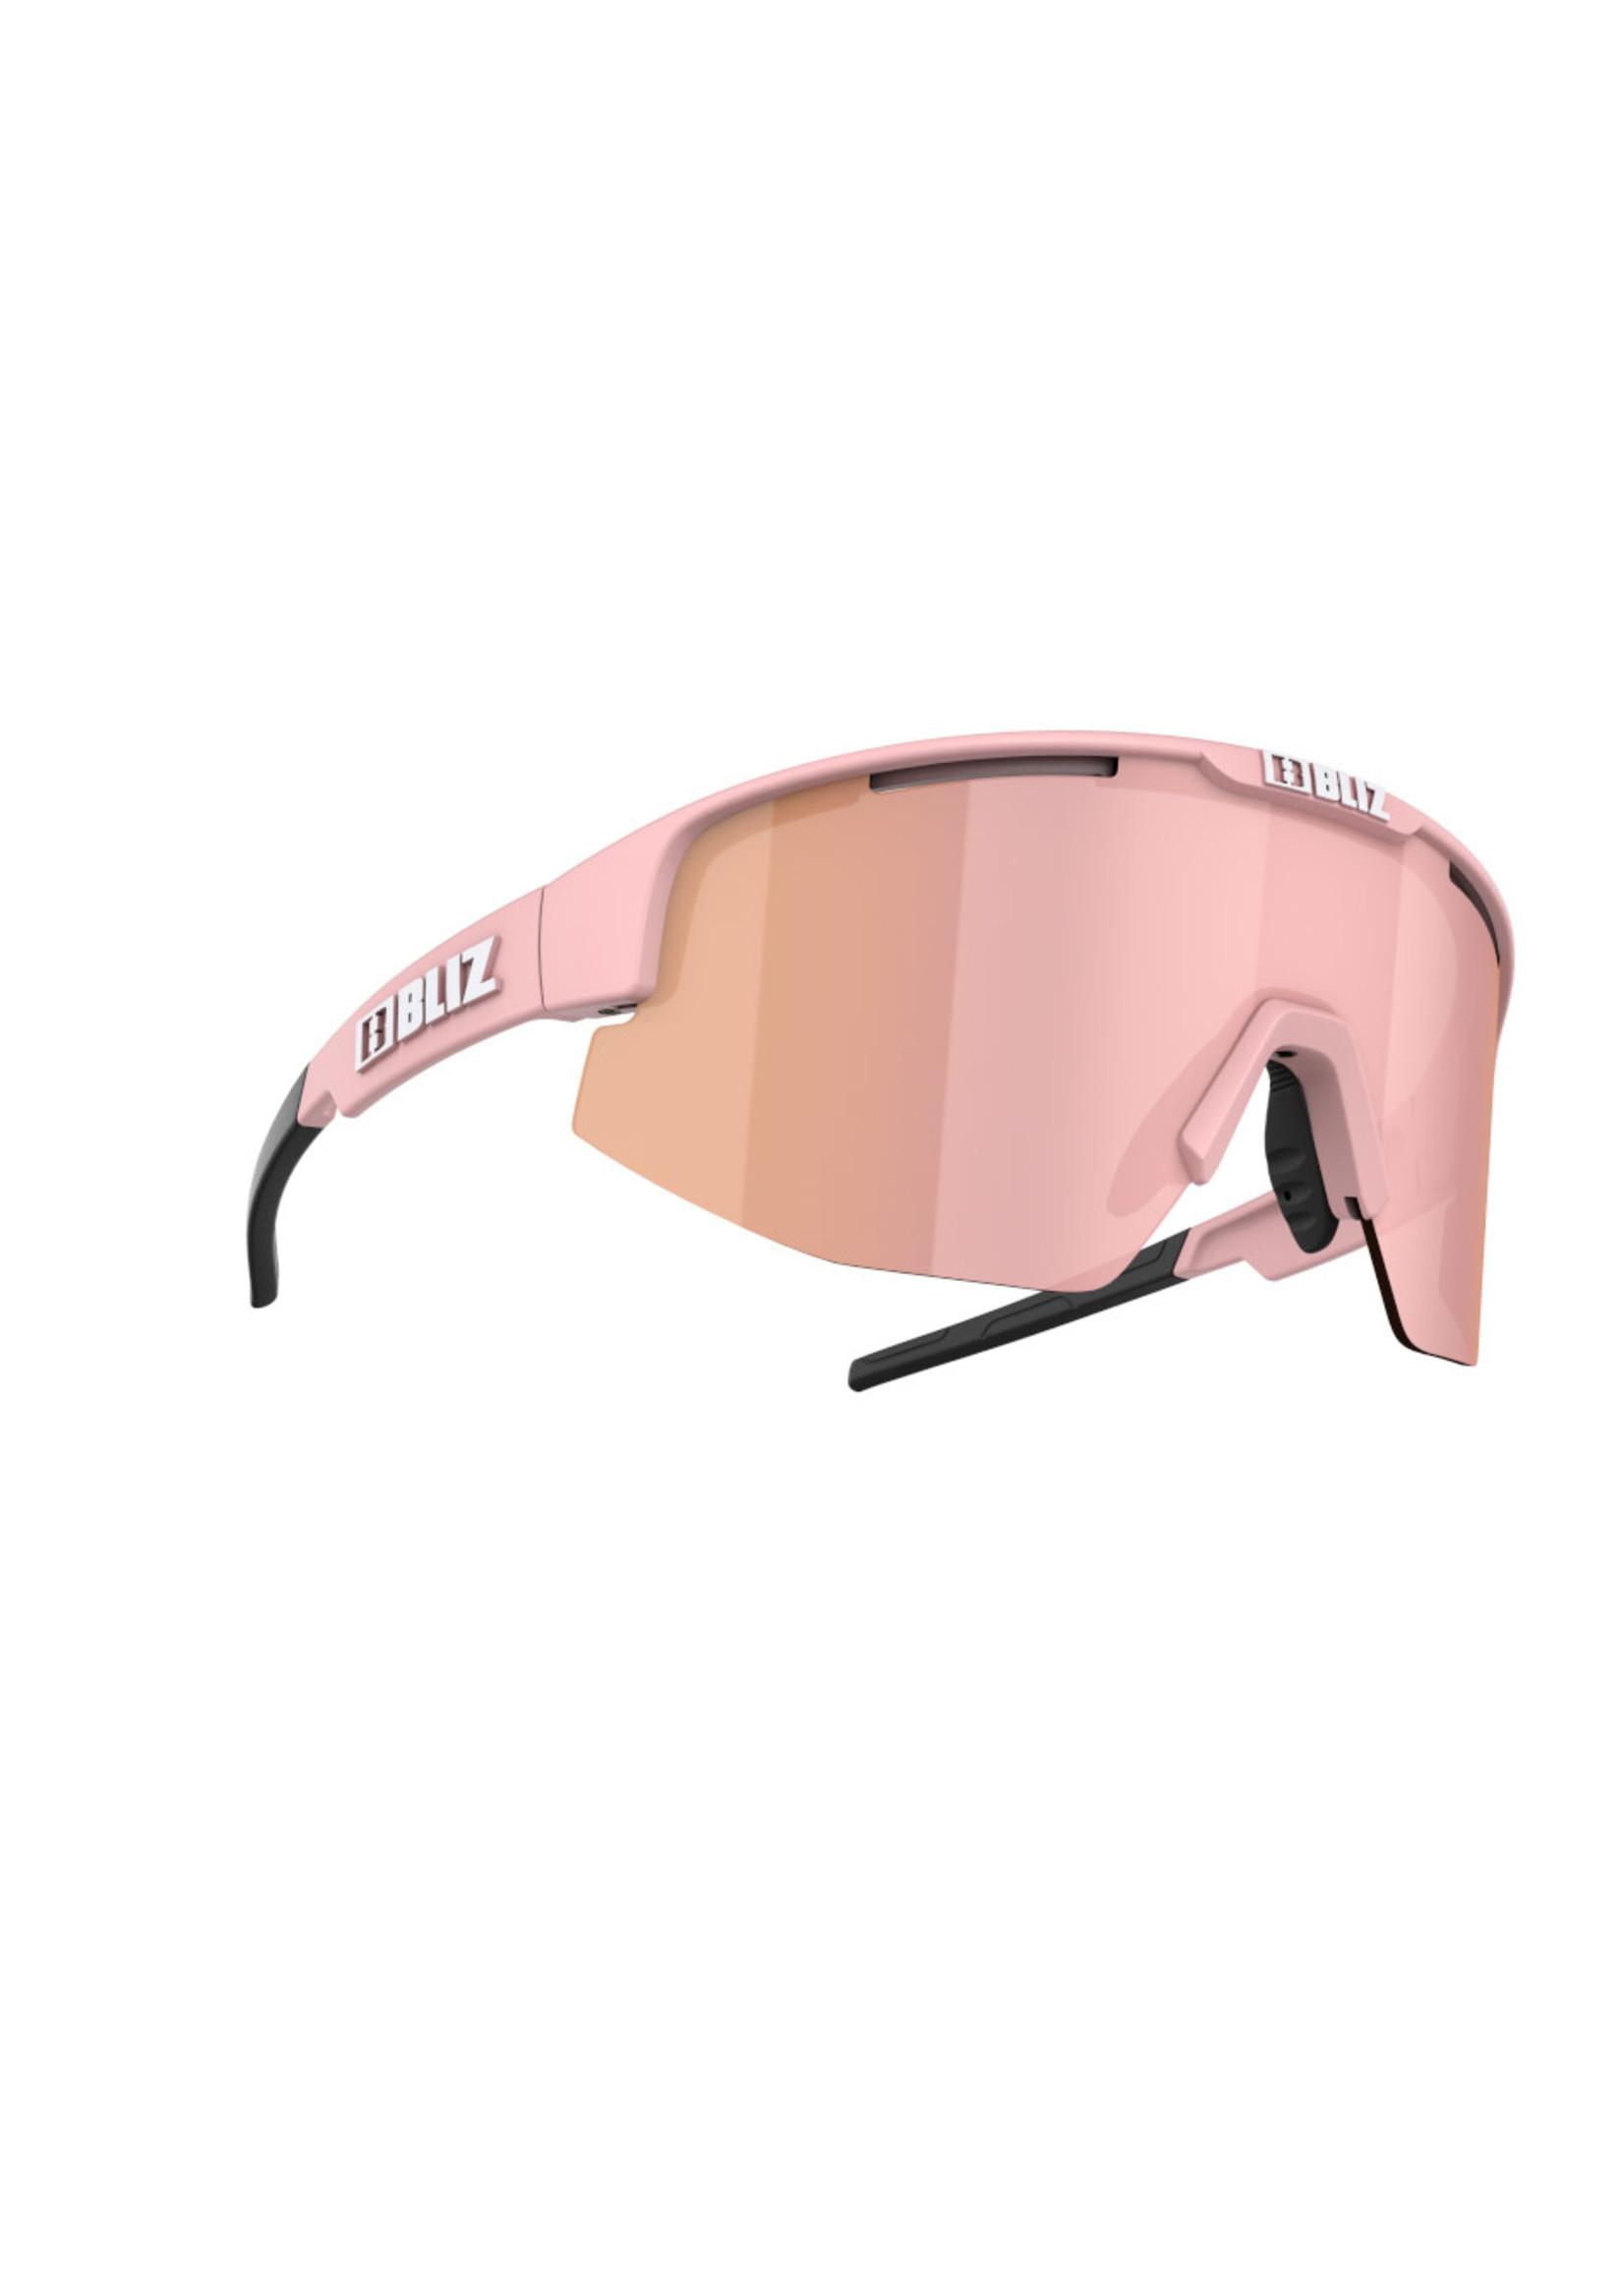 Bliz Eyewear Bliz Matrix lunettes, small